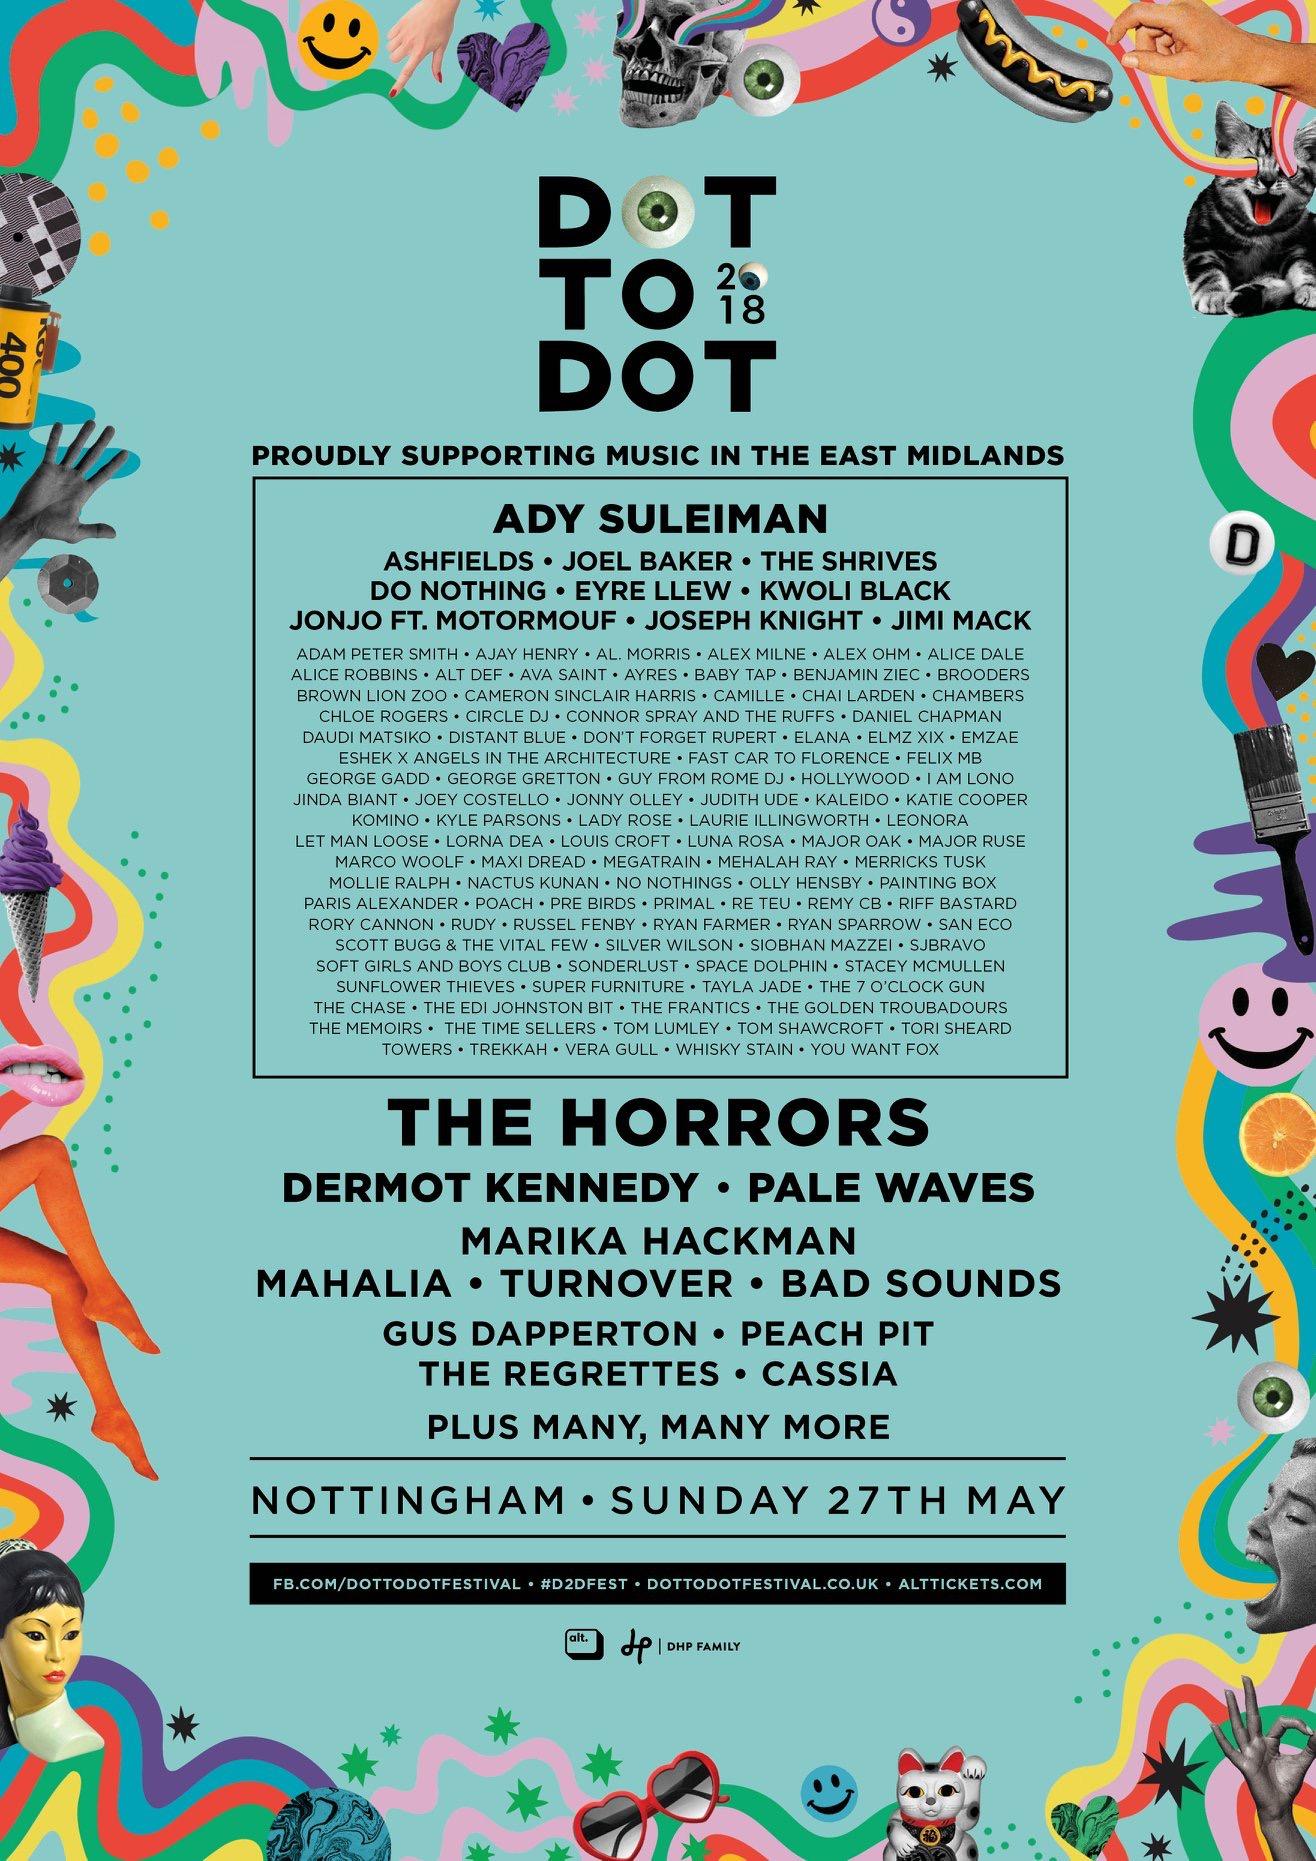 DotToDot-Nottingham_Mehalah Ray.JPG